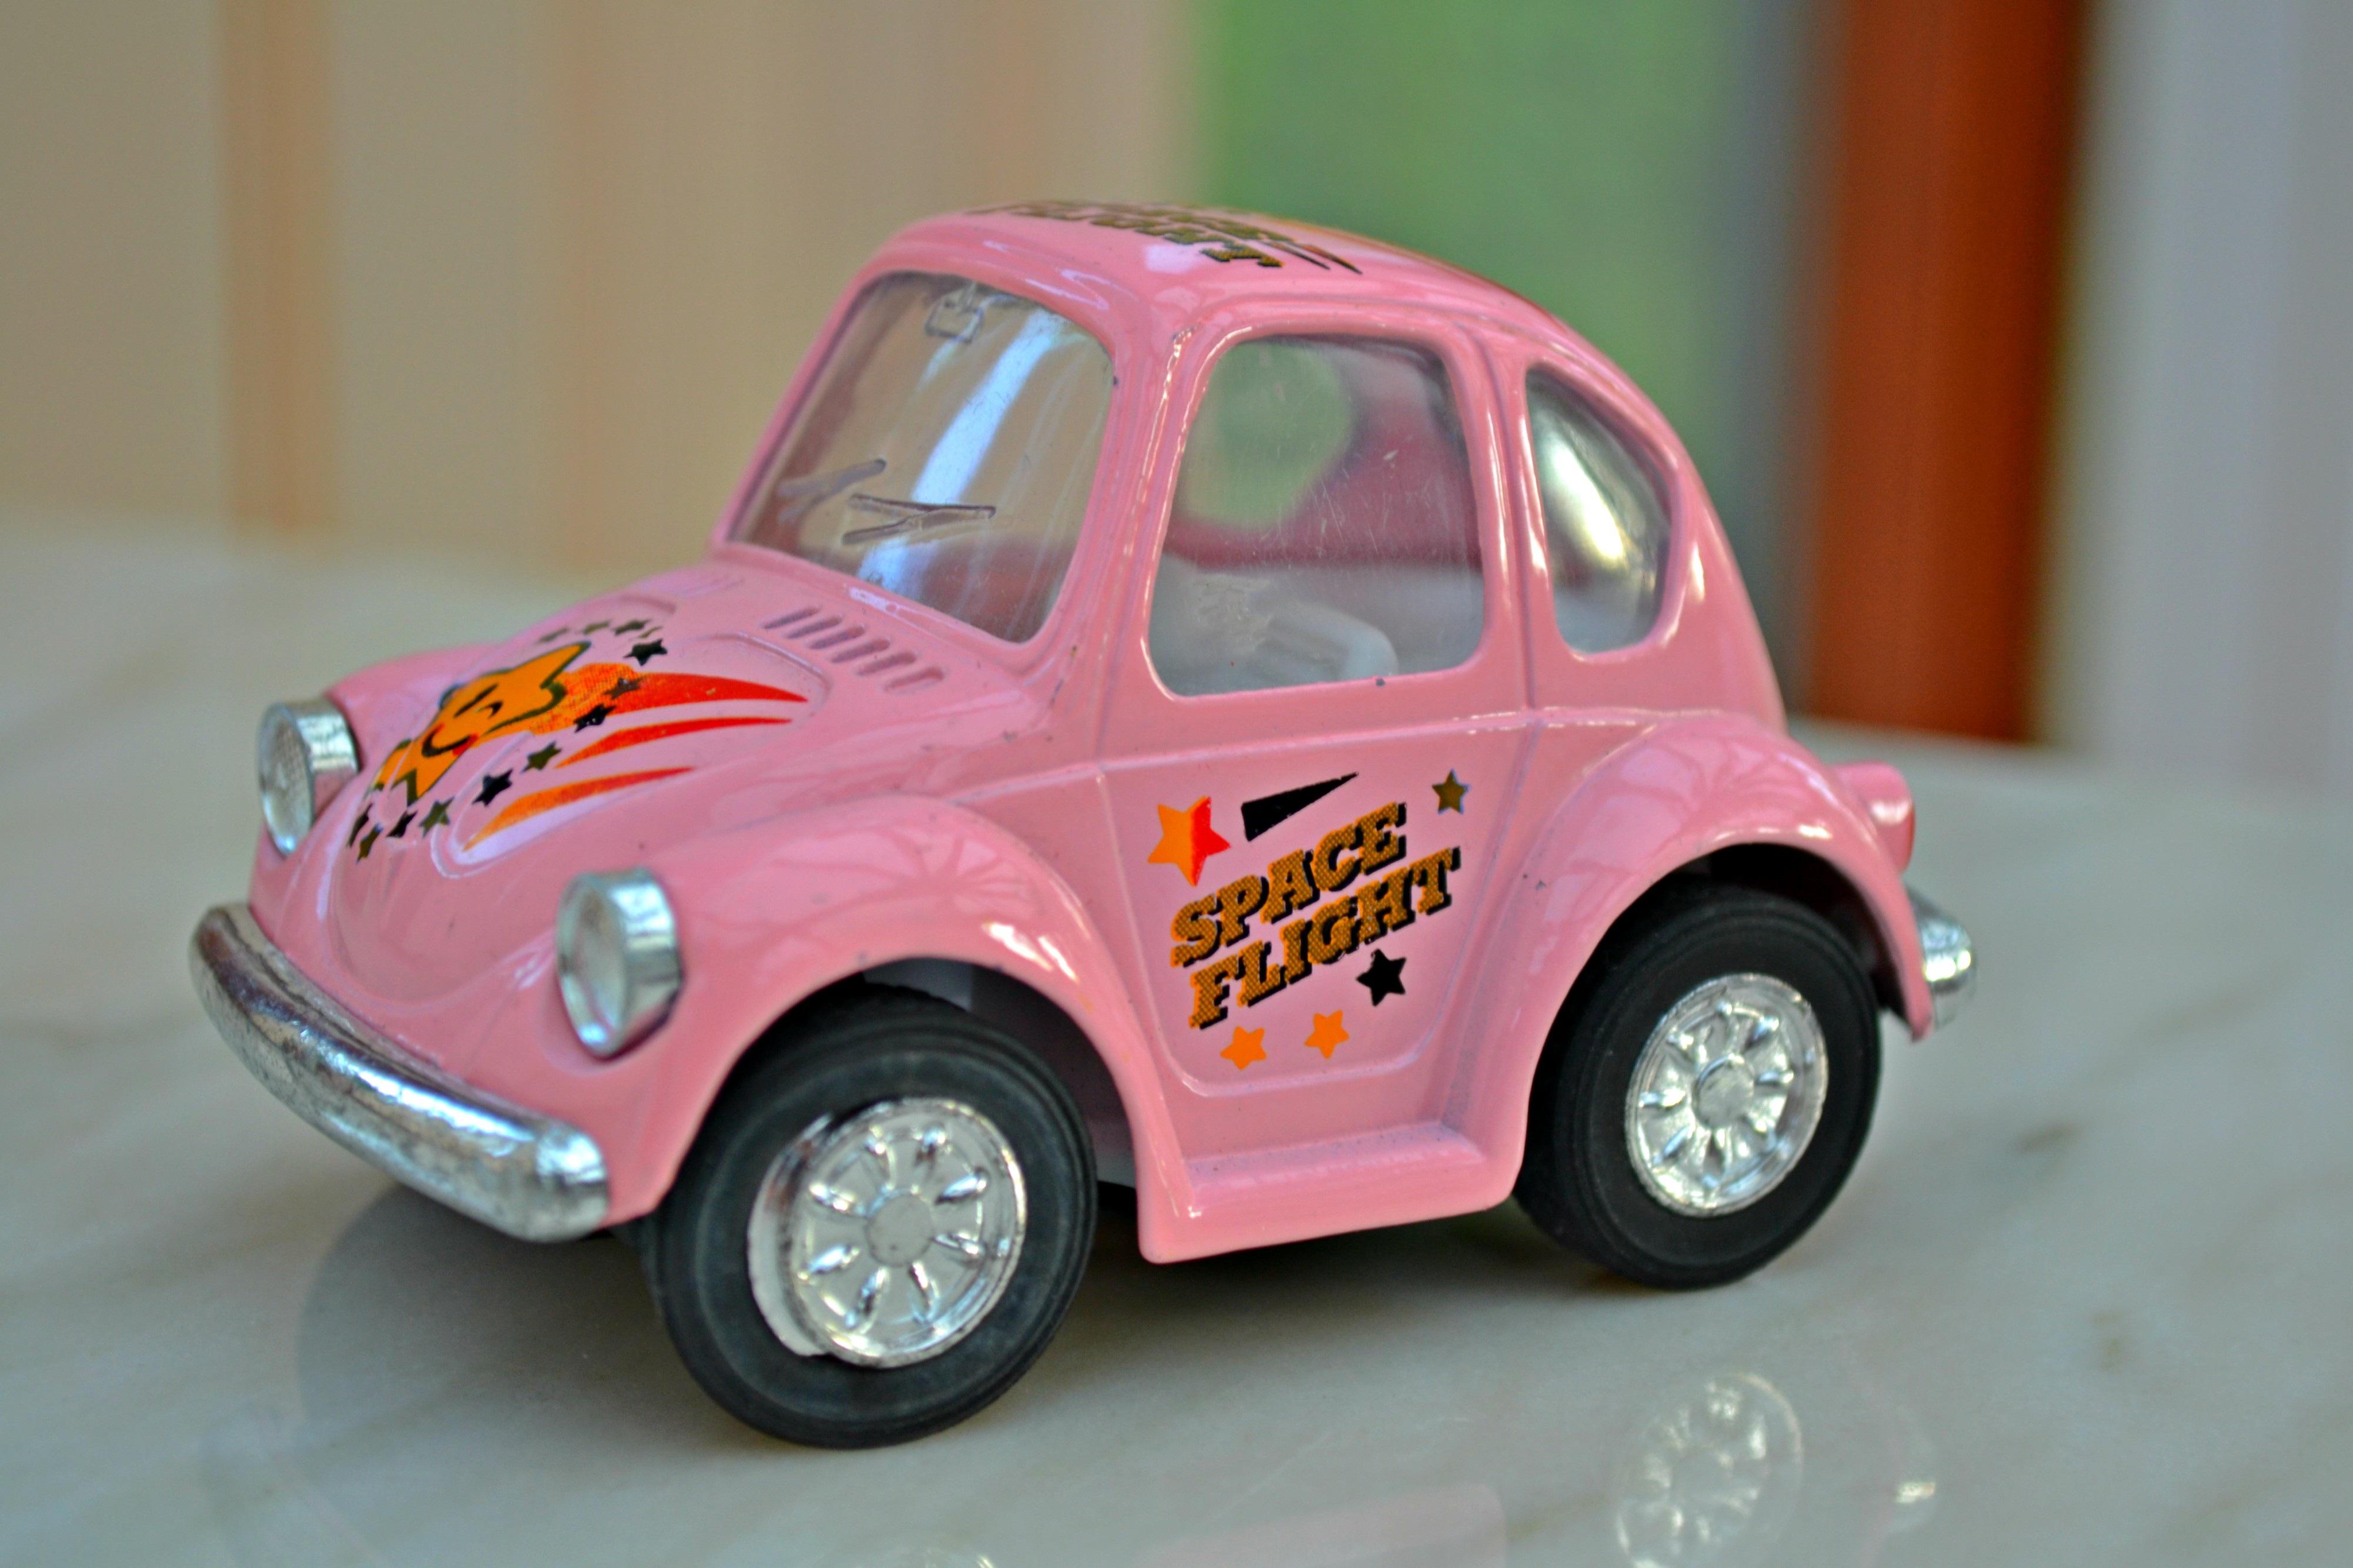 kostenlose foto auto fahrzeug klein rosa miniatur spielzeug spielzeugauto stadtauto